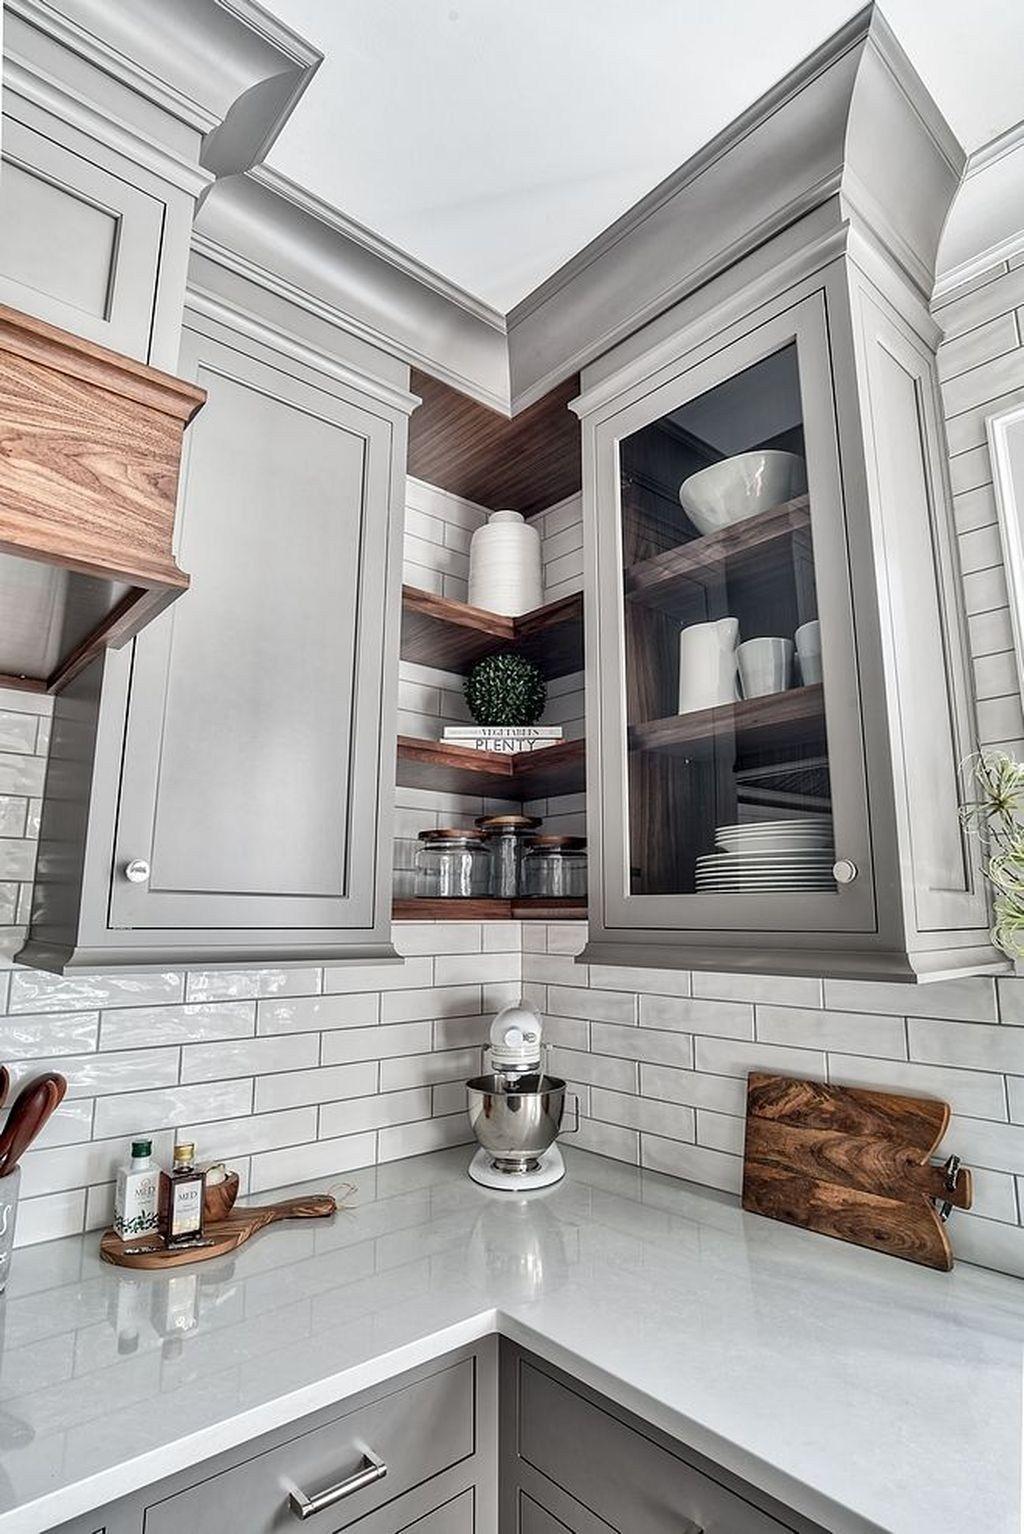 The best ideas for neutral kitchen design ideas inspiration